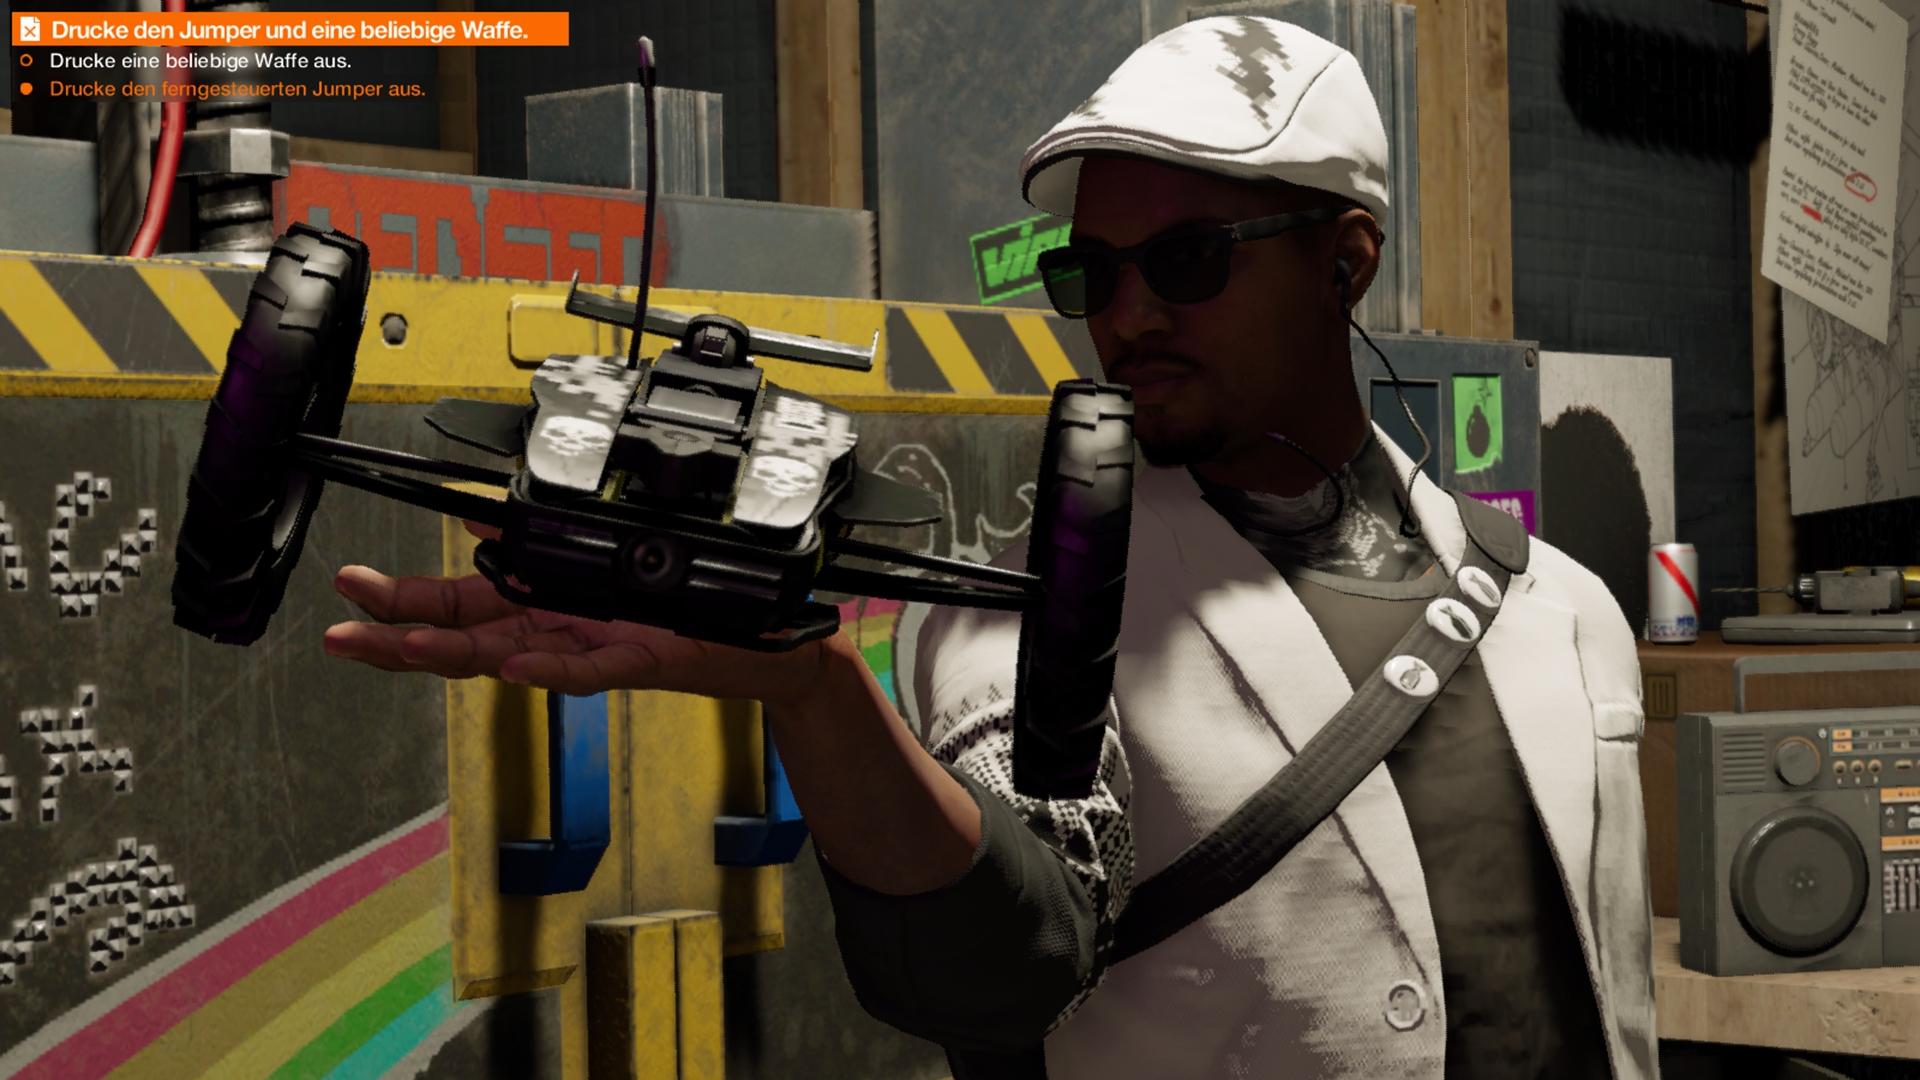 Watch_Dogs 2: Screenshots aus dem Spiel